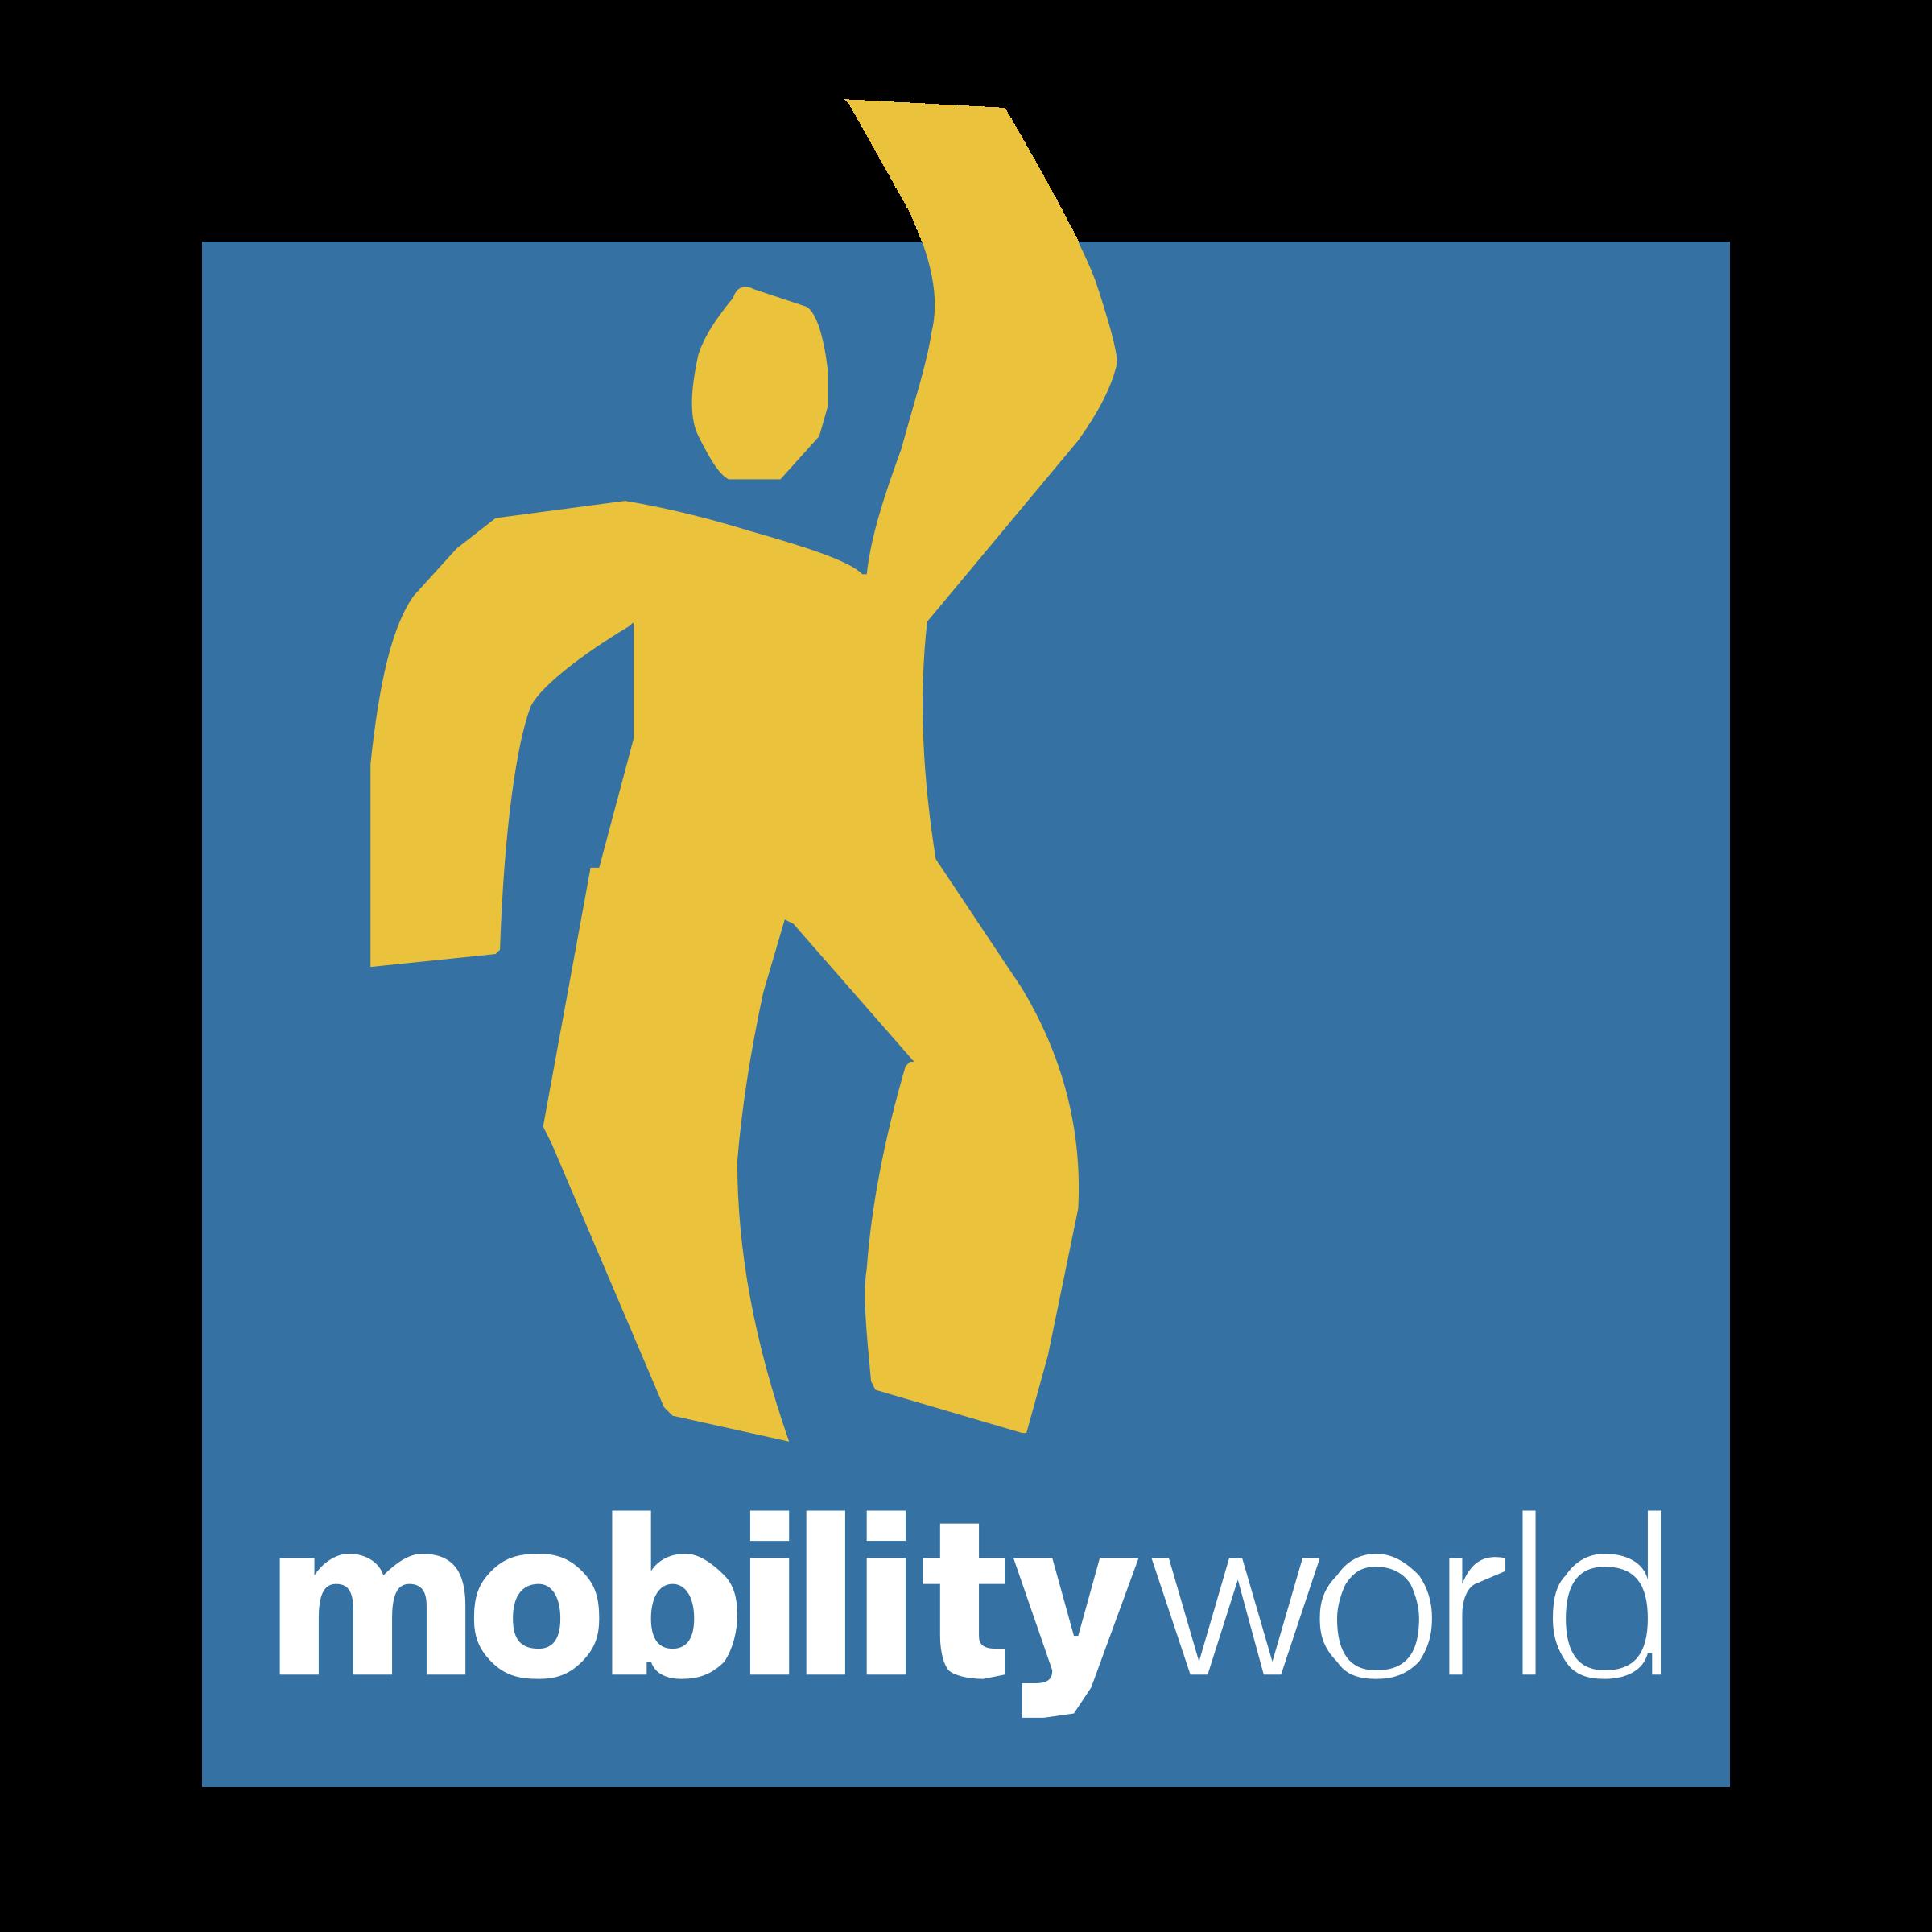 01f078e7914 Mobility World Logo PNG Transparent   SVG Vector - Freebie Supply